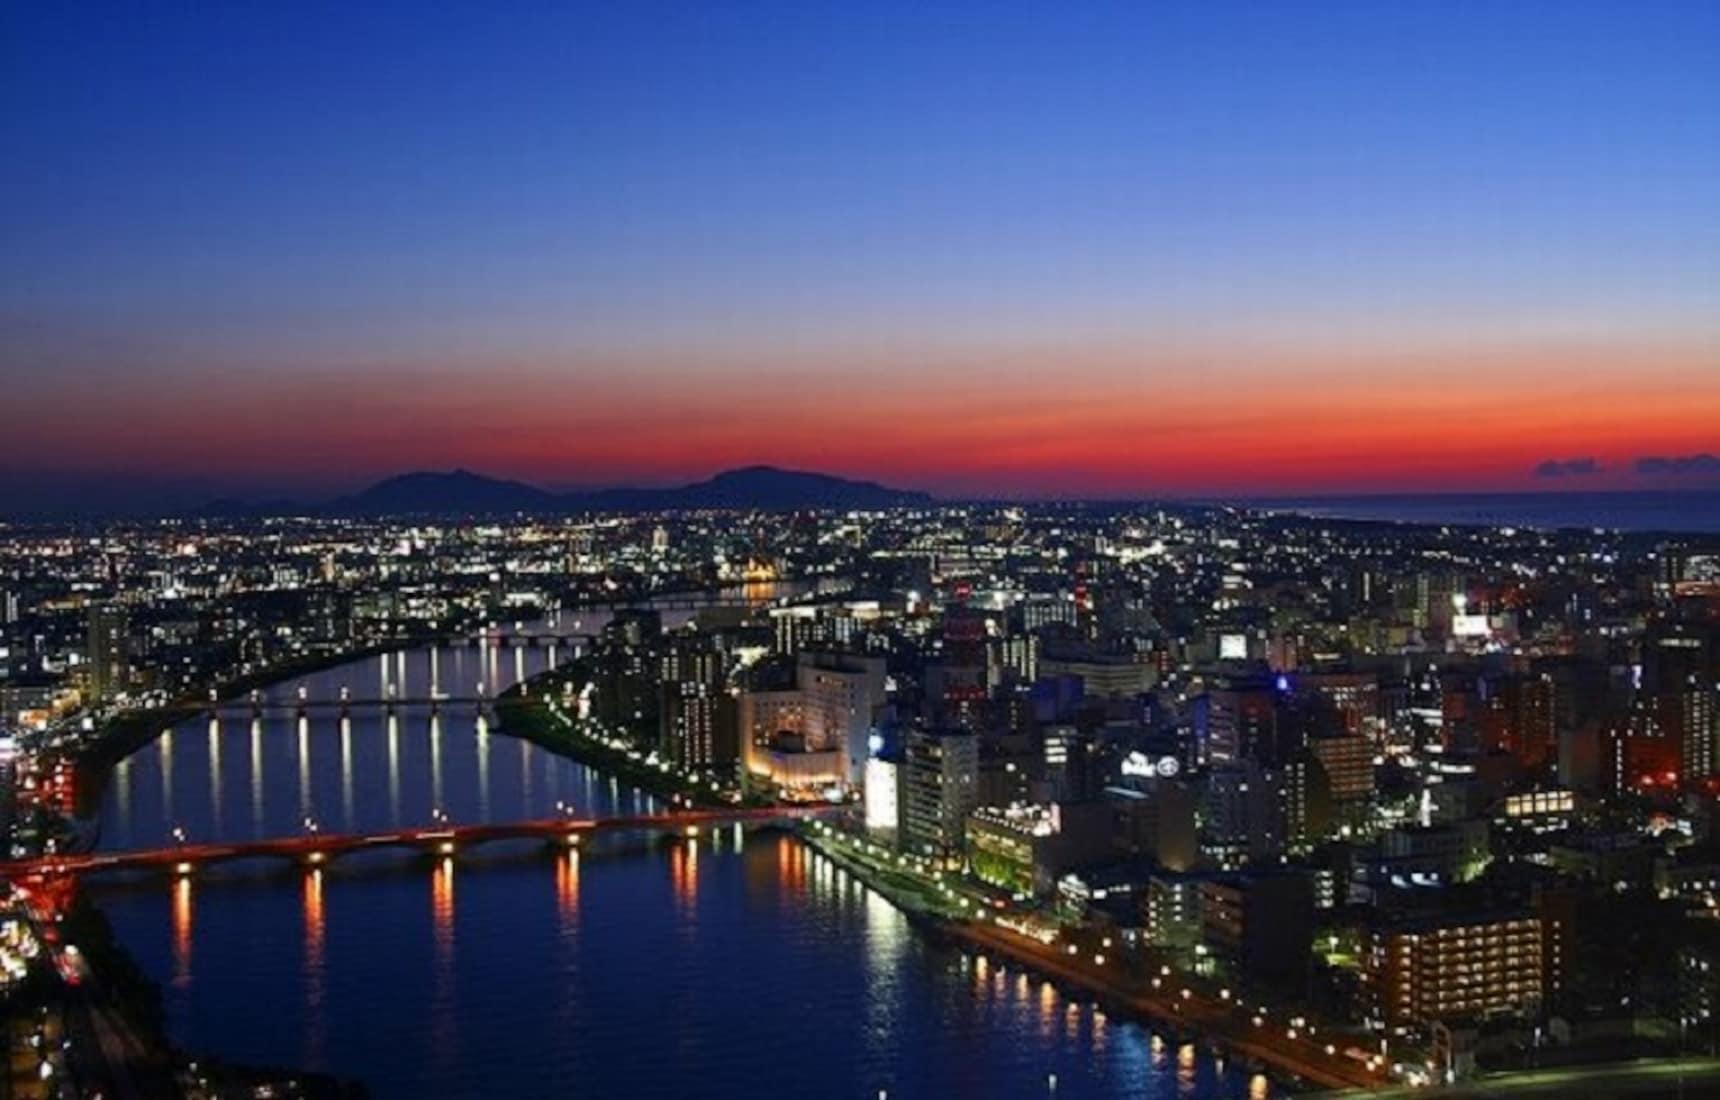 Niigata: The 'Ricebasket' of Japan